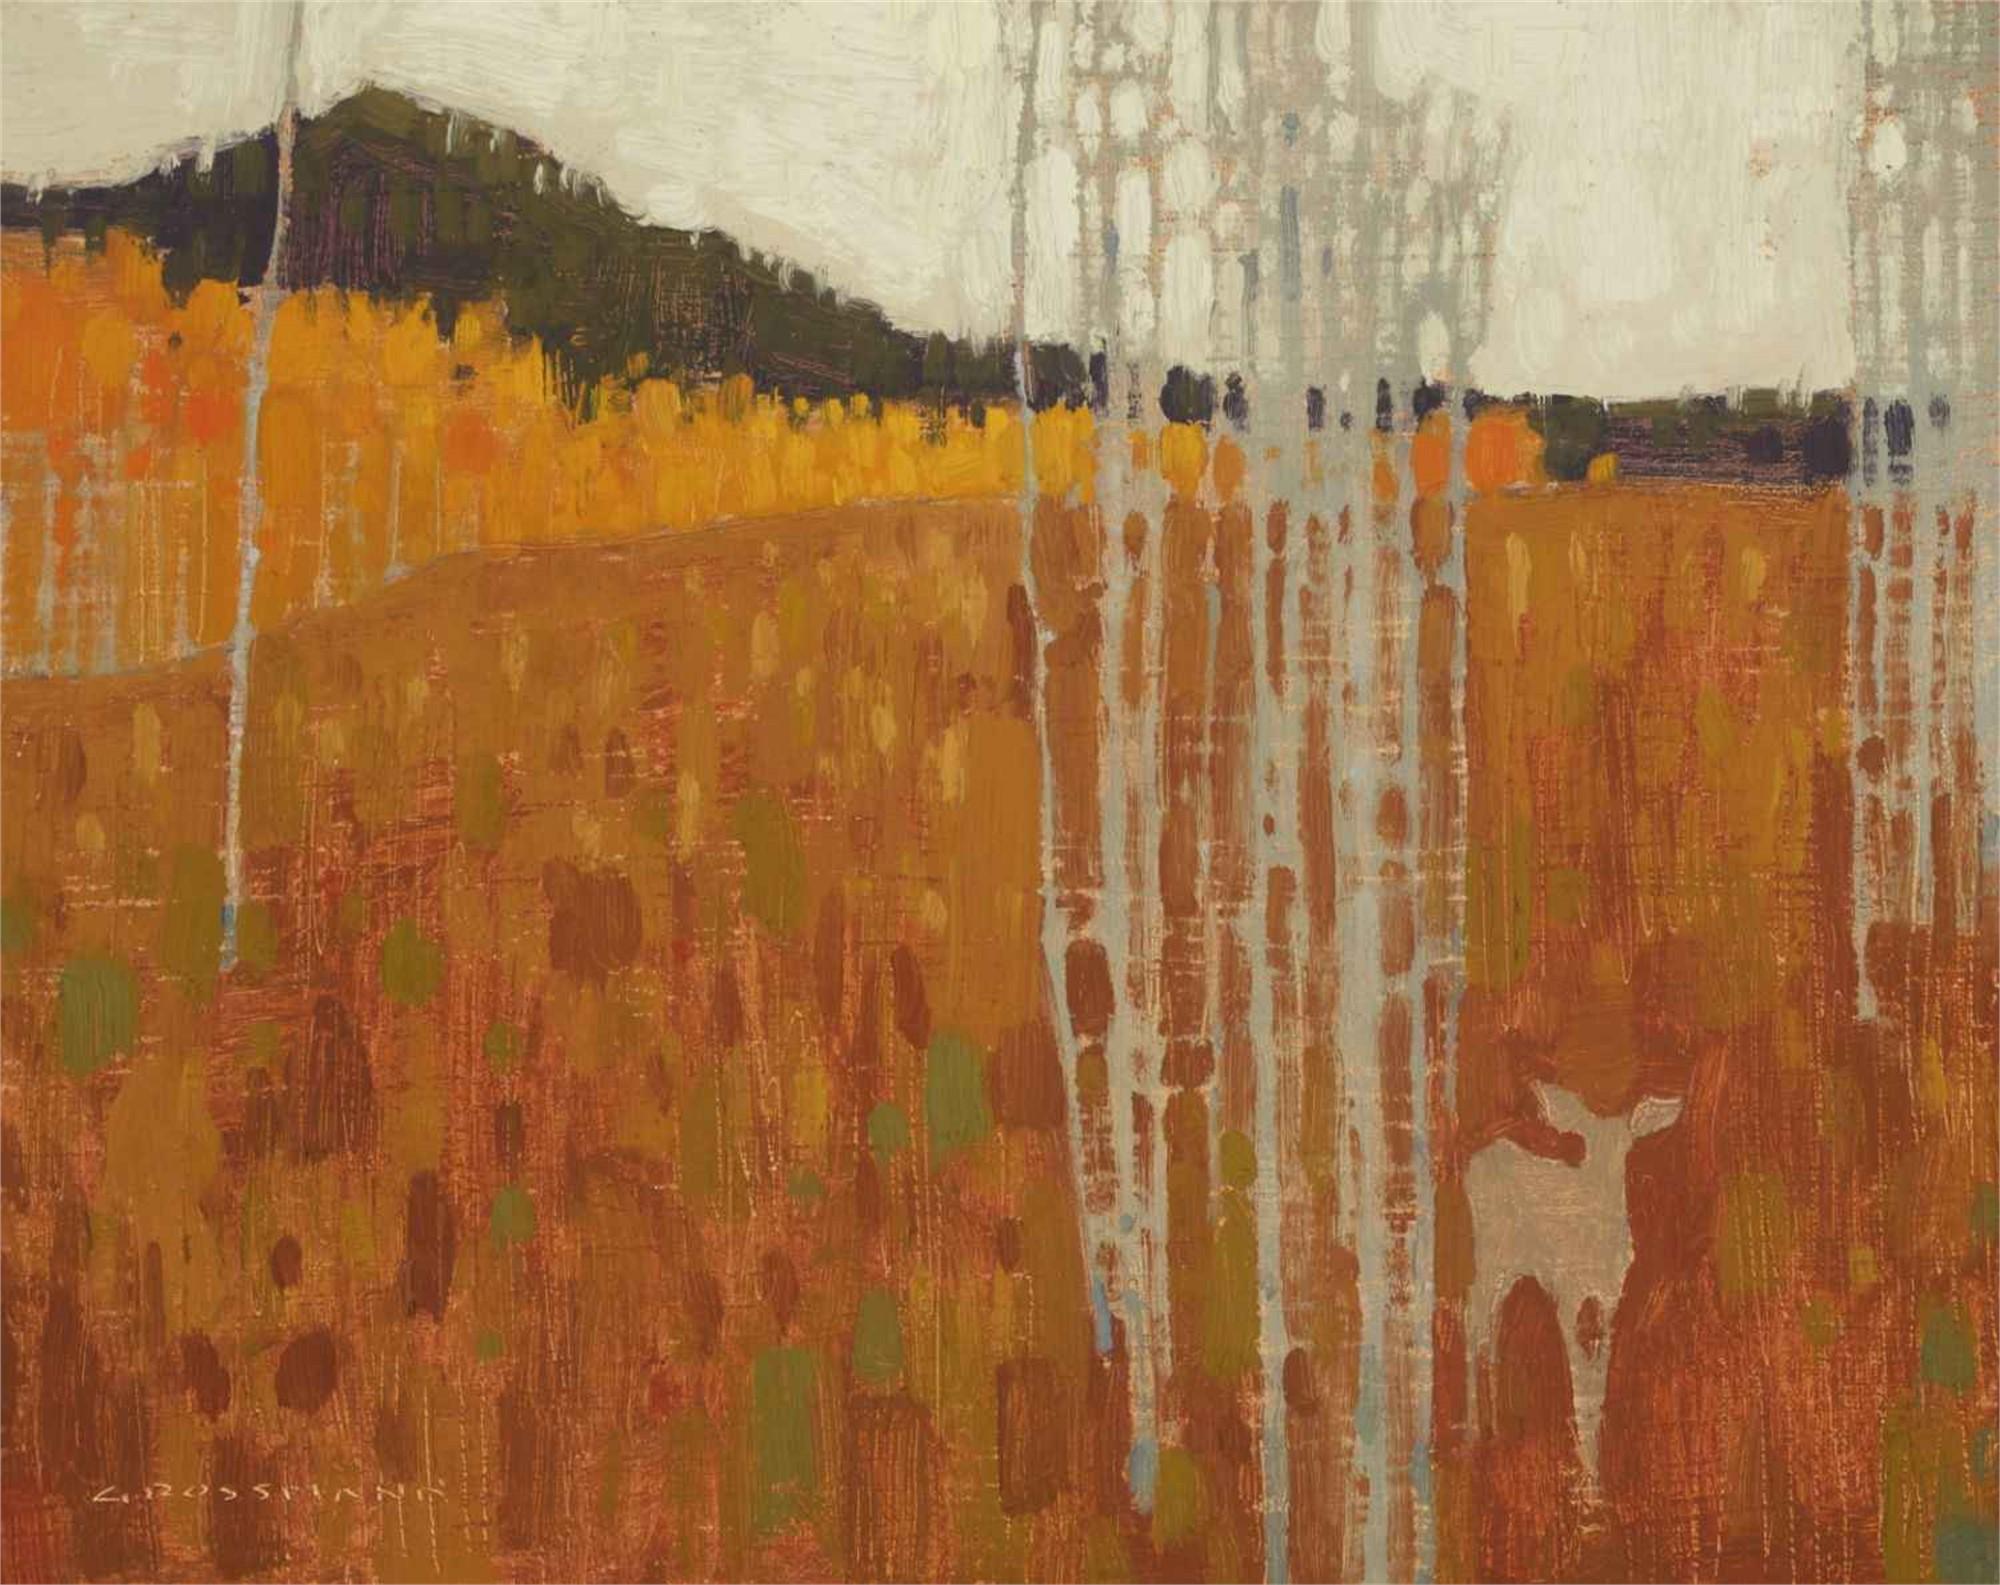 Late Autumn Wandering by David Grossmann